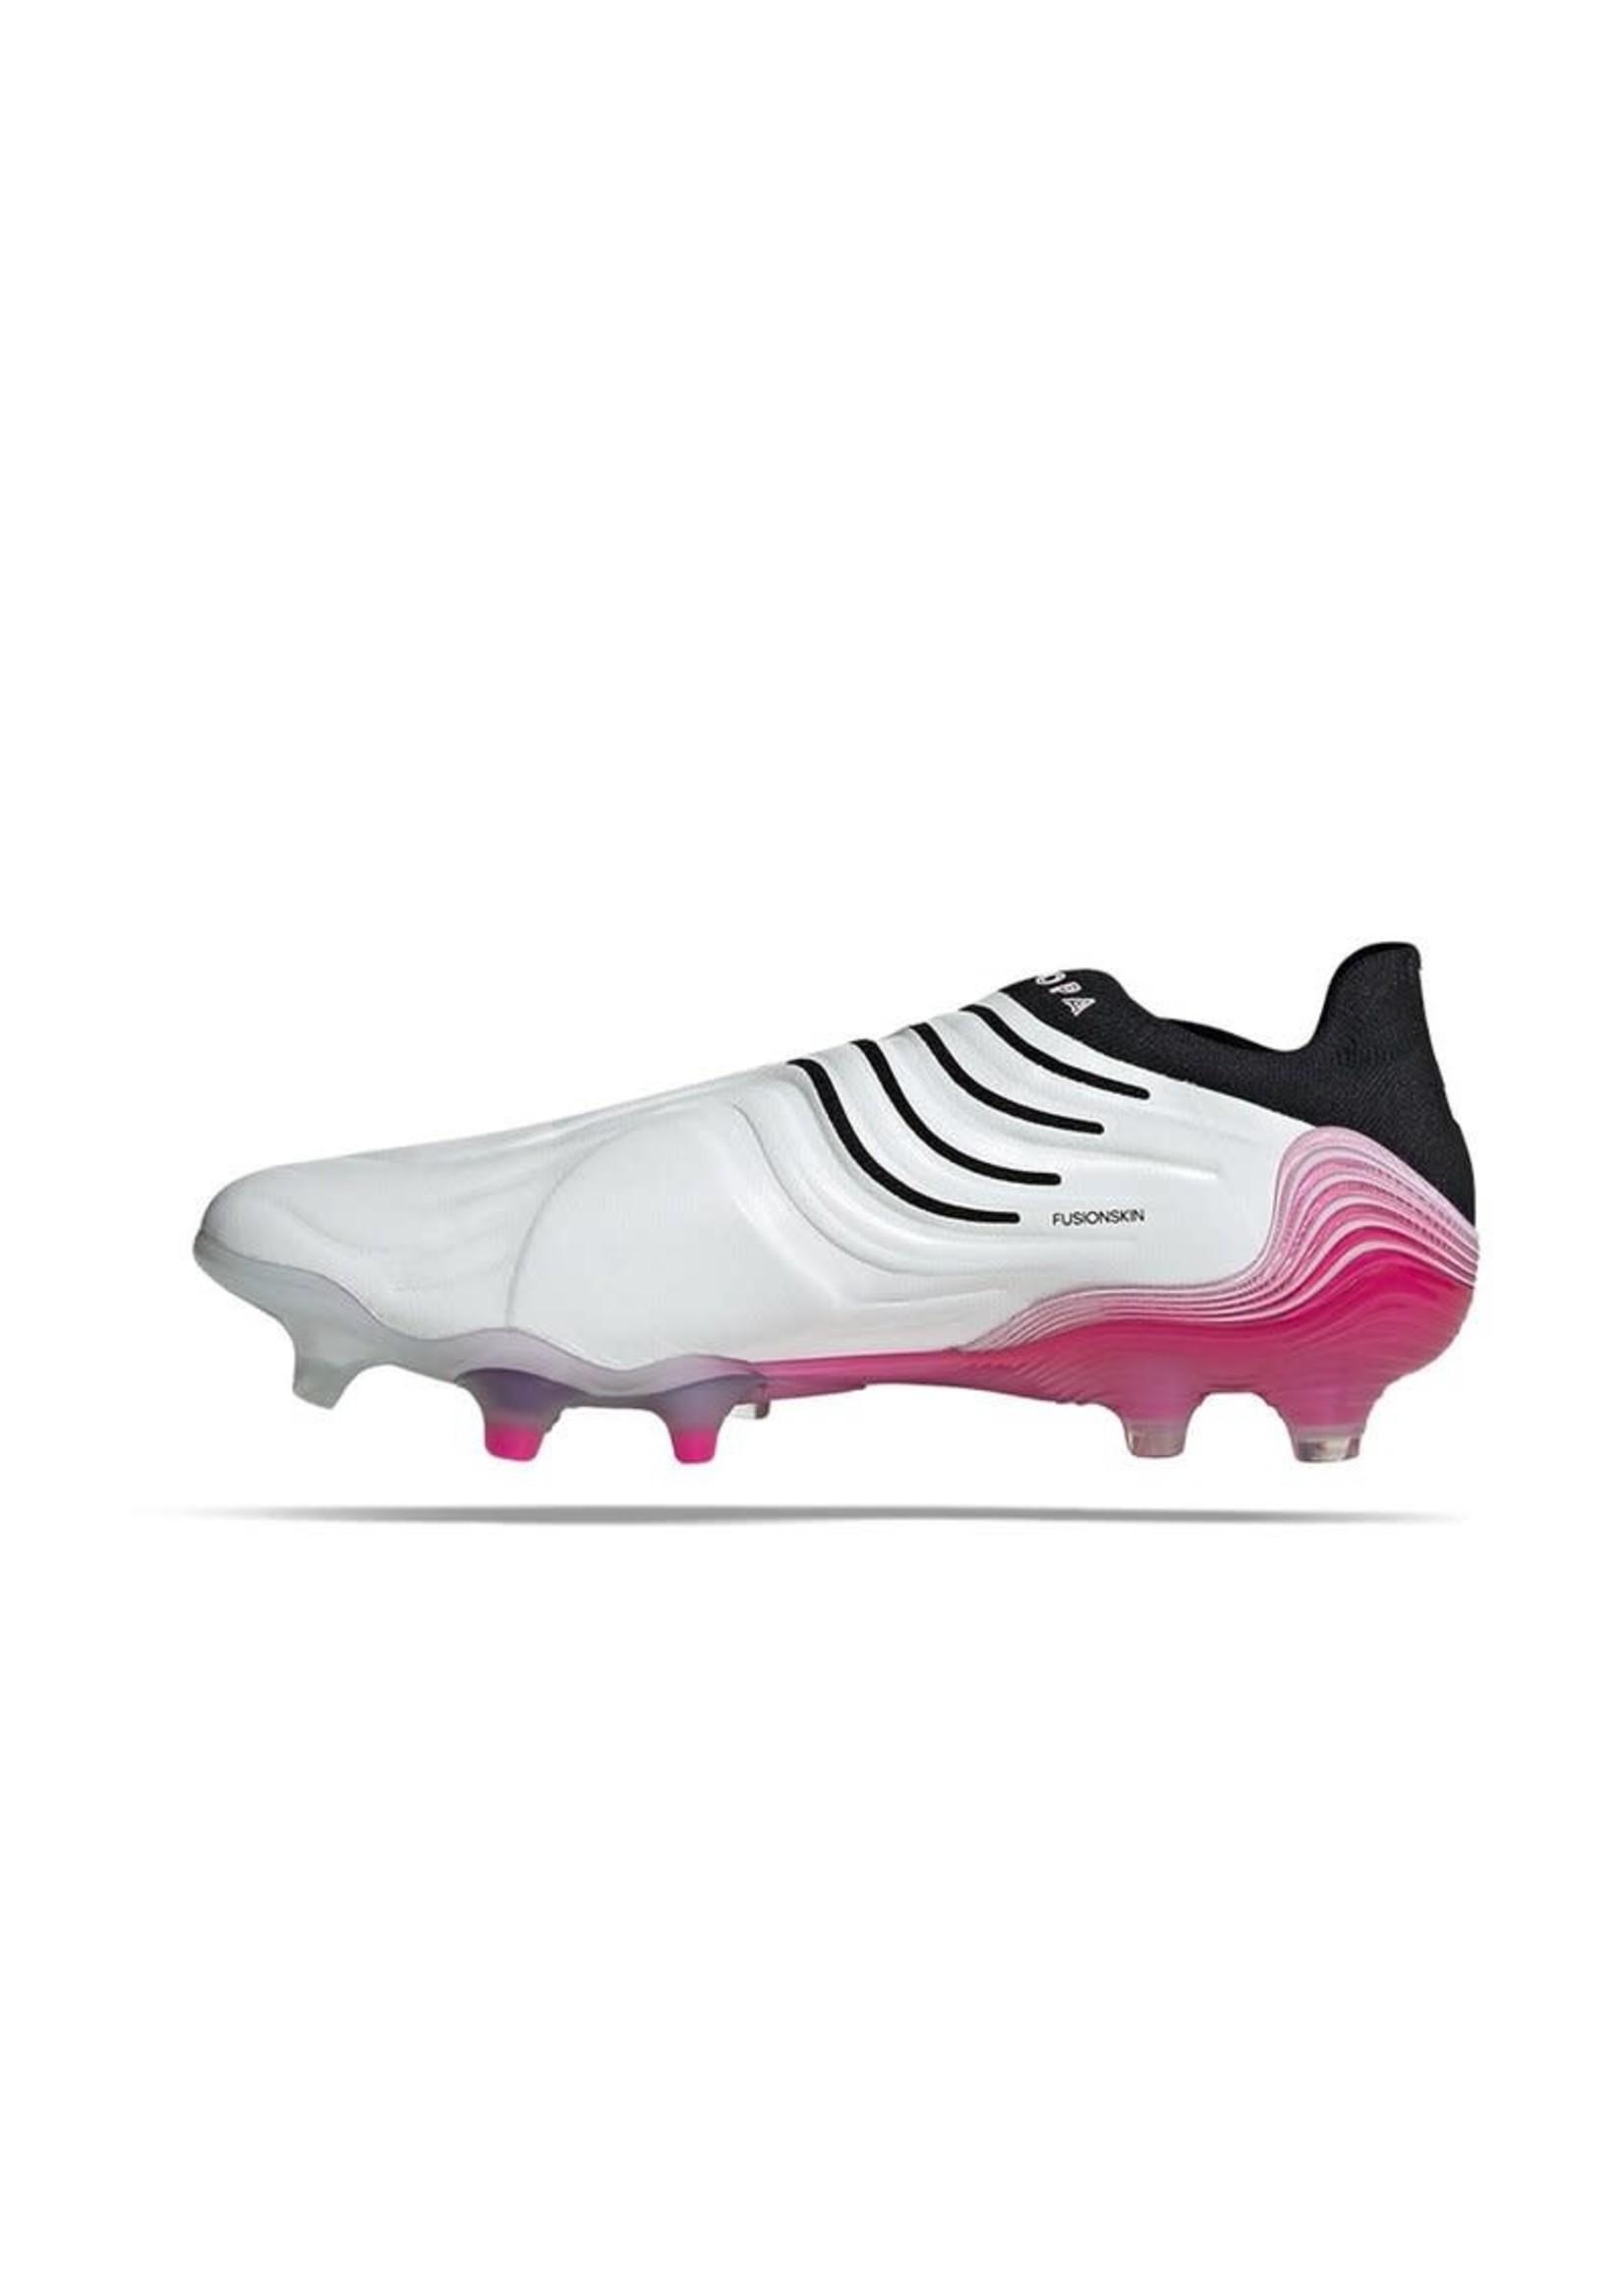 Adidas Copa Sense+ FG - FW7917